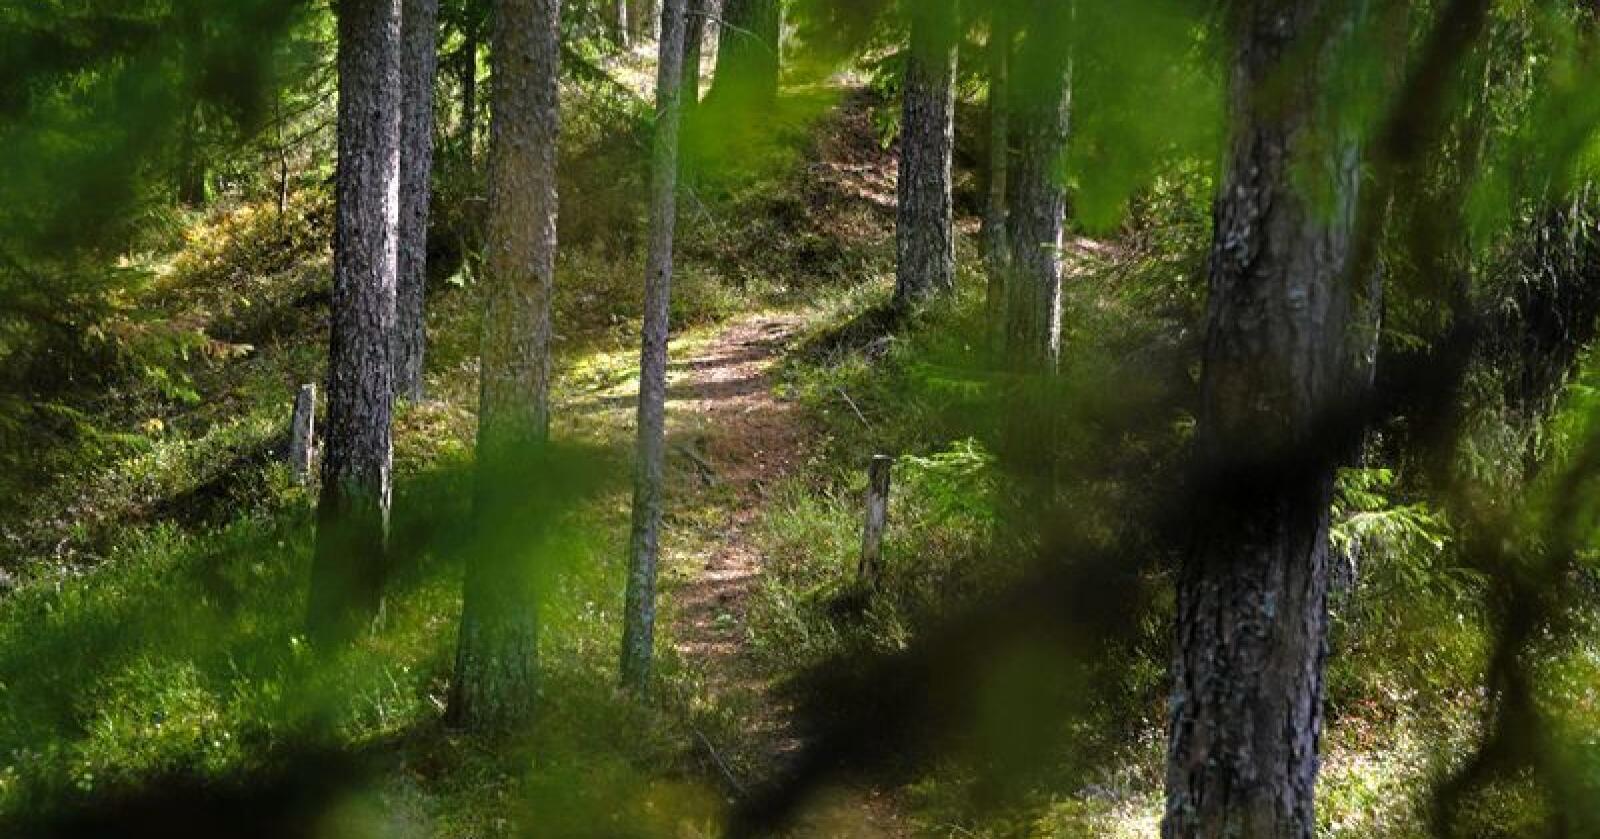 Løsning: Stien minner oss om naturlige sammenhenger, skriver kronikøren. Foto: Bjørn Ivar Voll